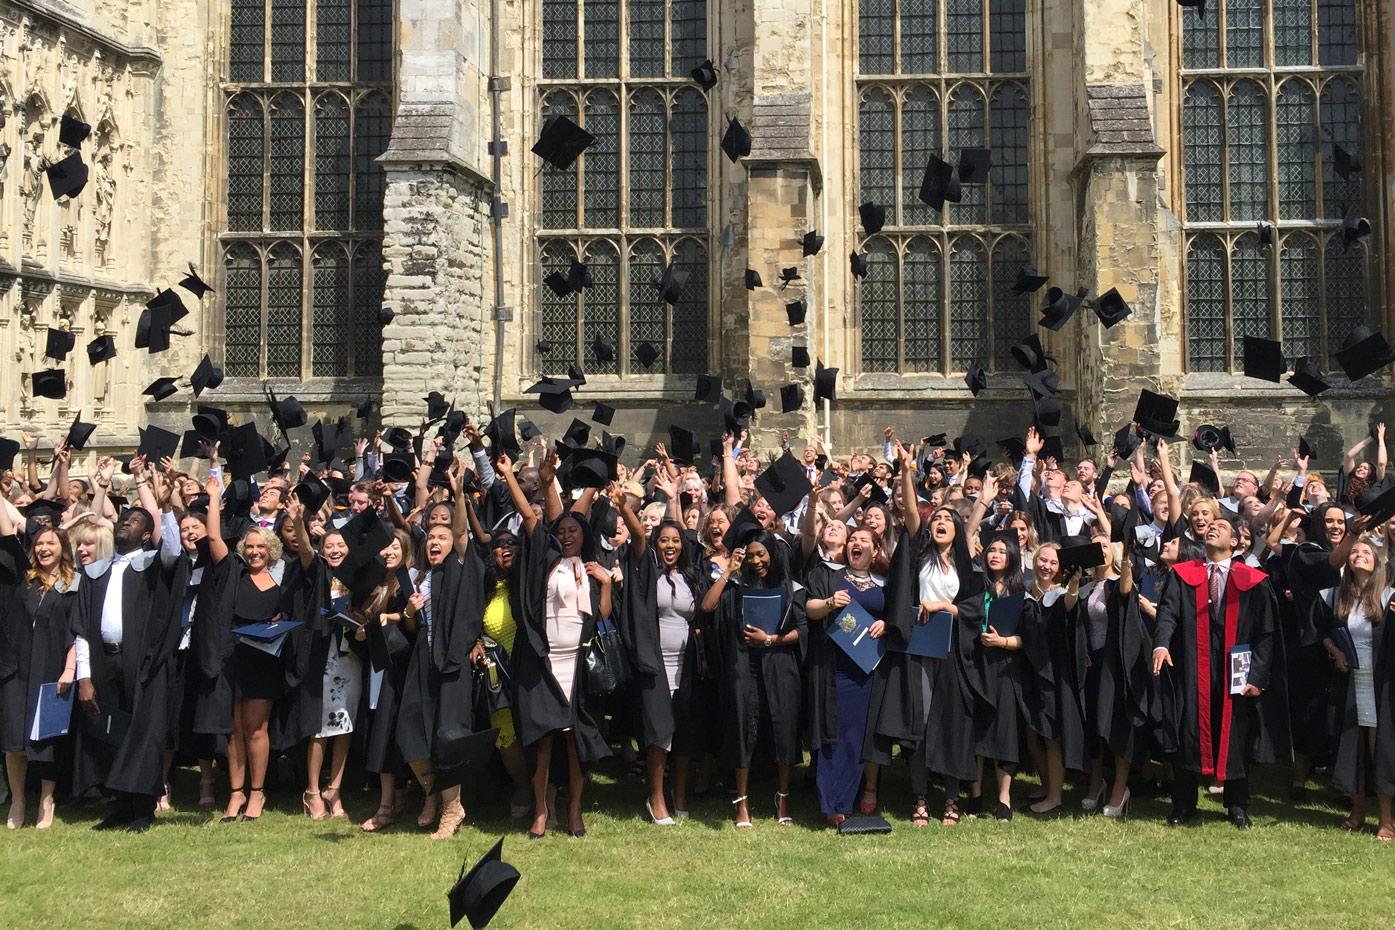 İngiltere Üniversiteleri - University of Kent | İngiltere'de Yüksek Lisans 2